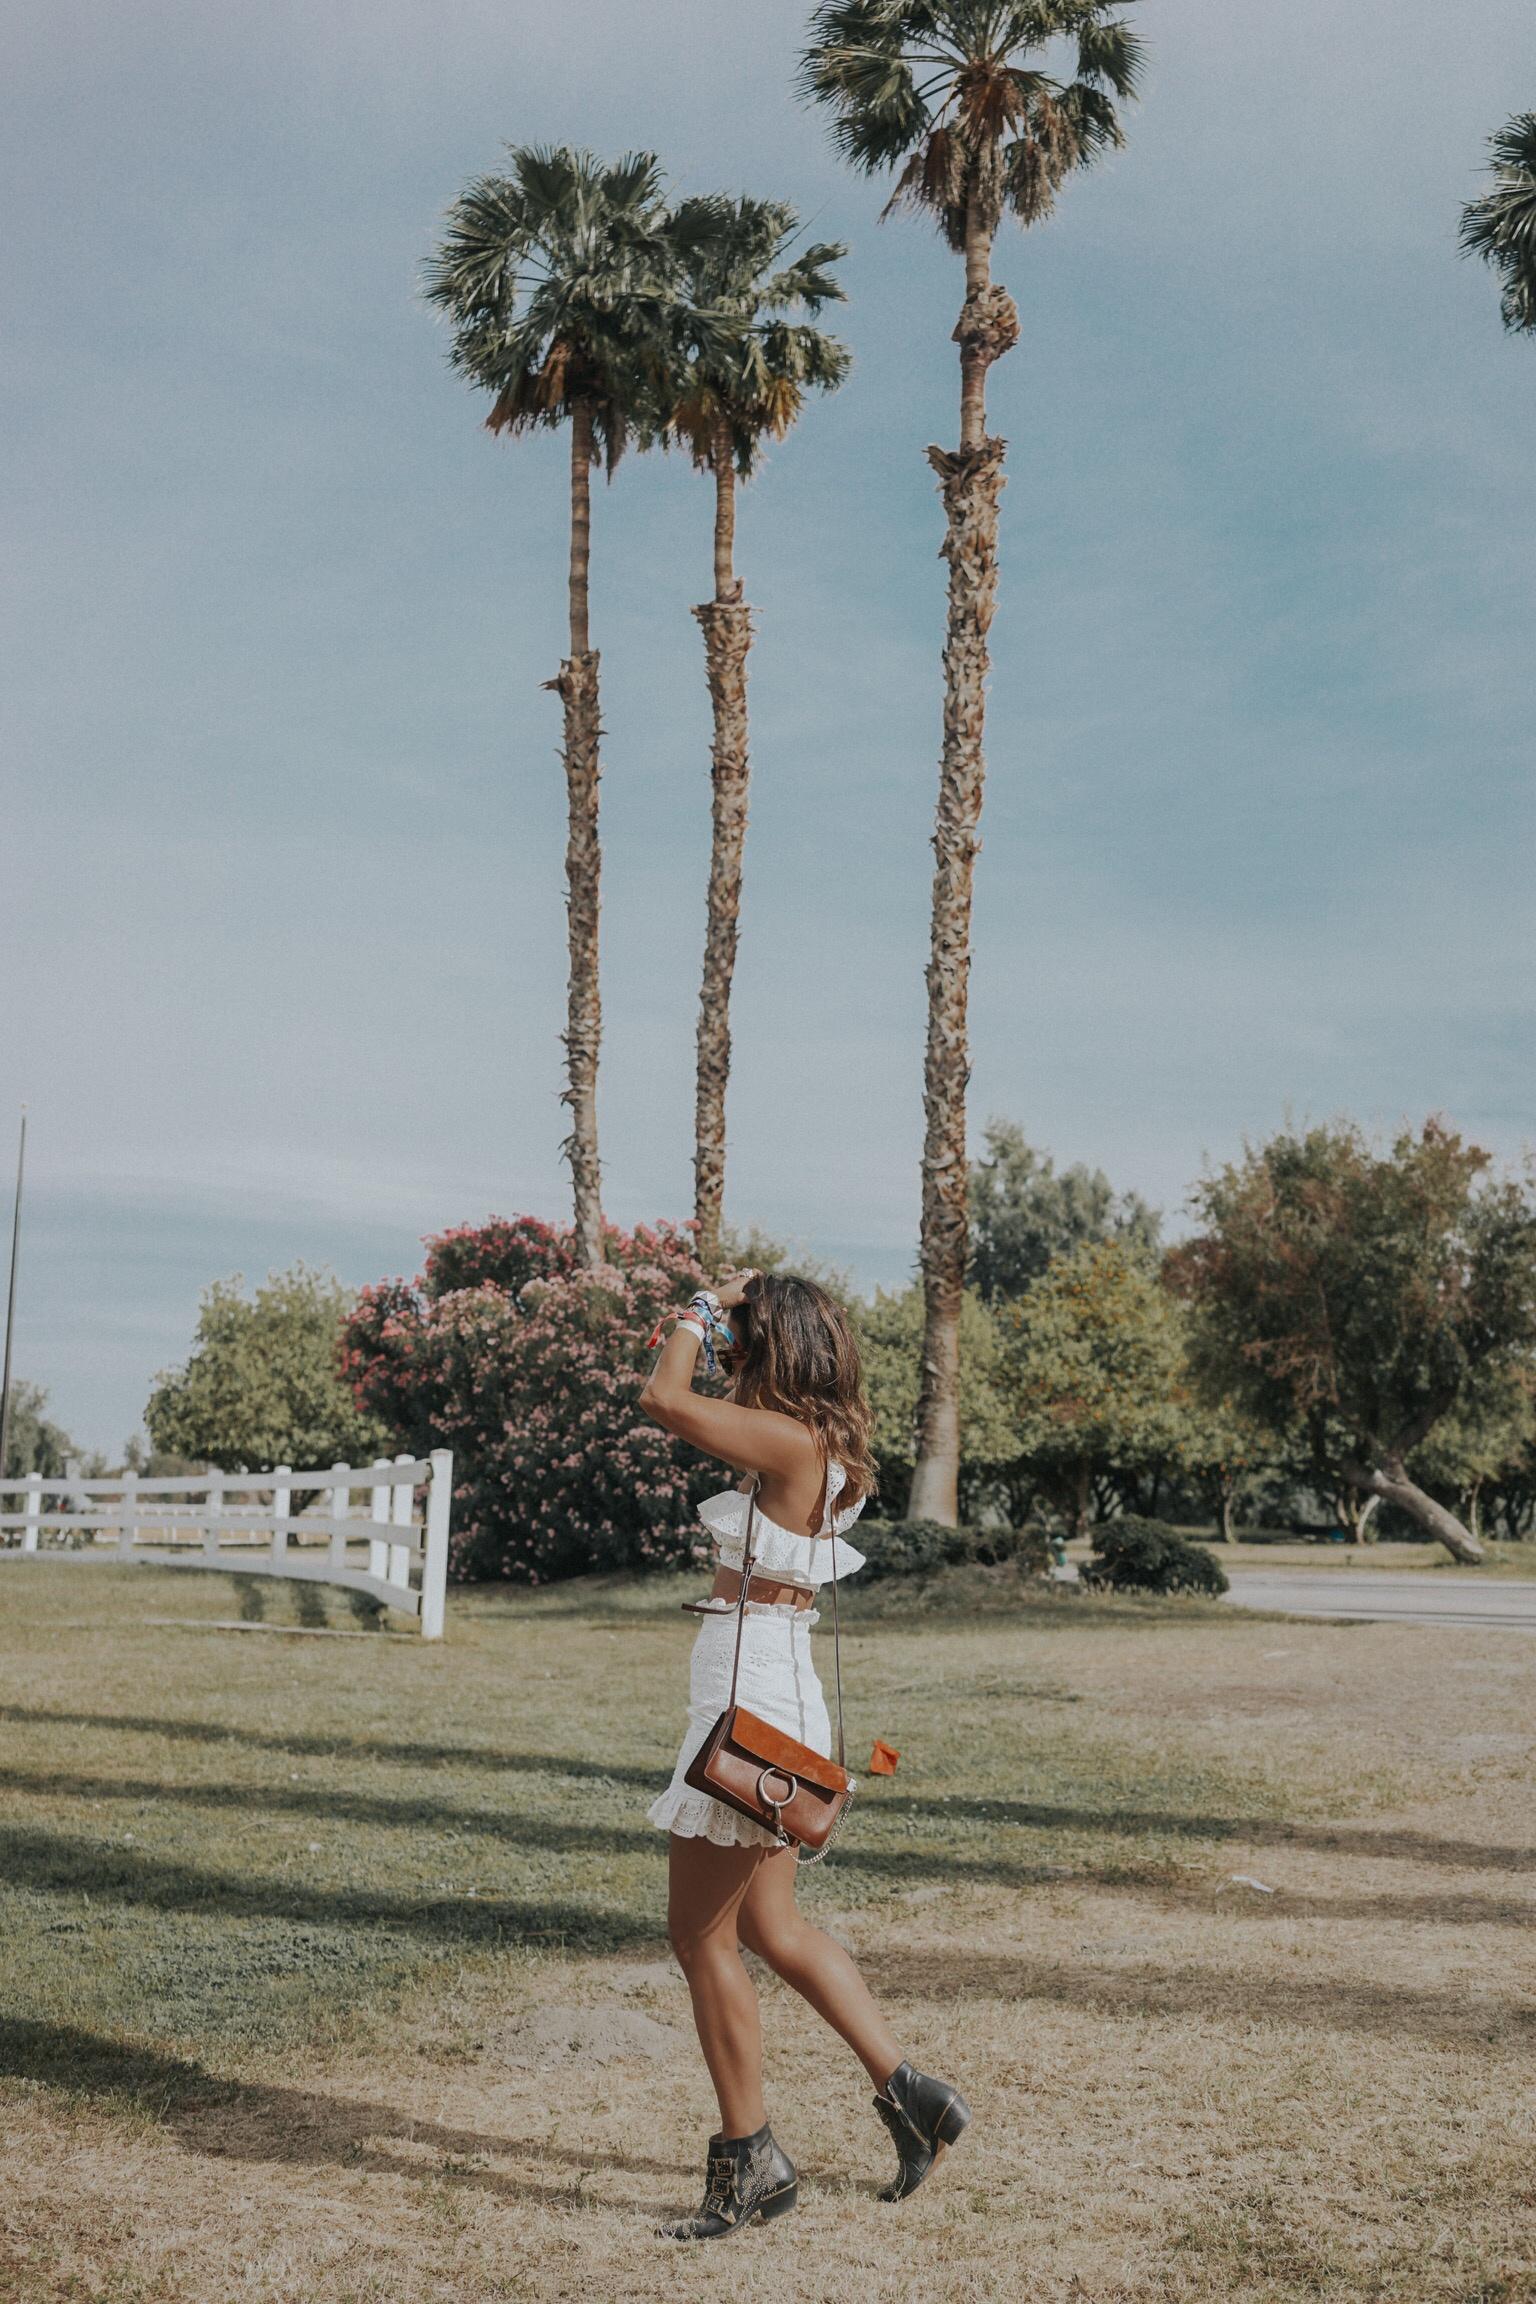 Sara of Collage Vintage at Coachella 2018